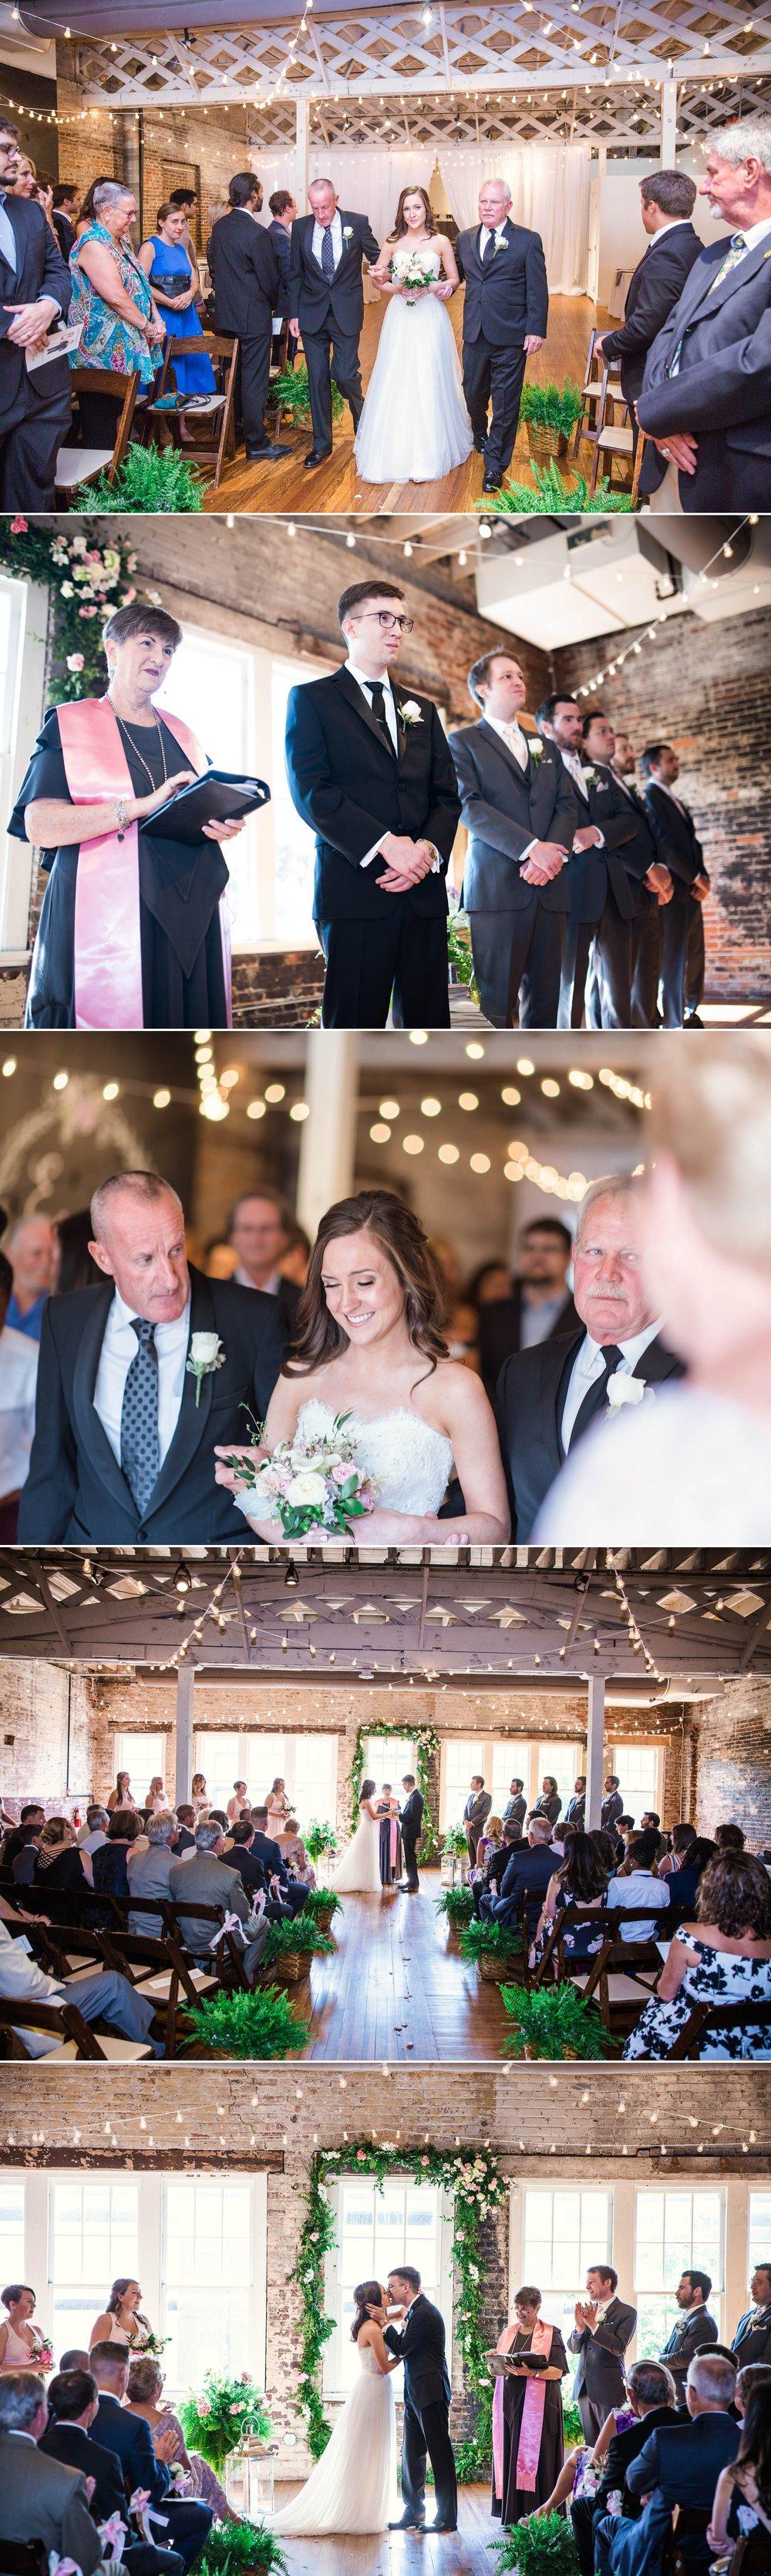 Elizabeth + Kane - Wedding at the Stockroom at 230 - Raleigh North Carolina Wedding Photographer 8.jpg